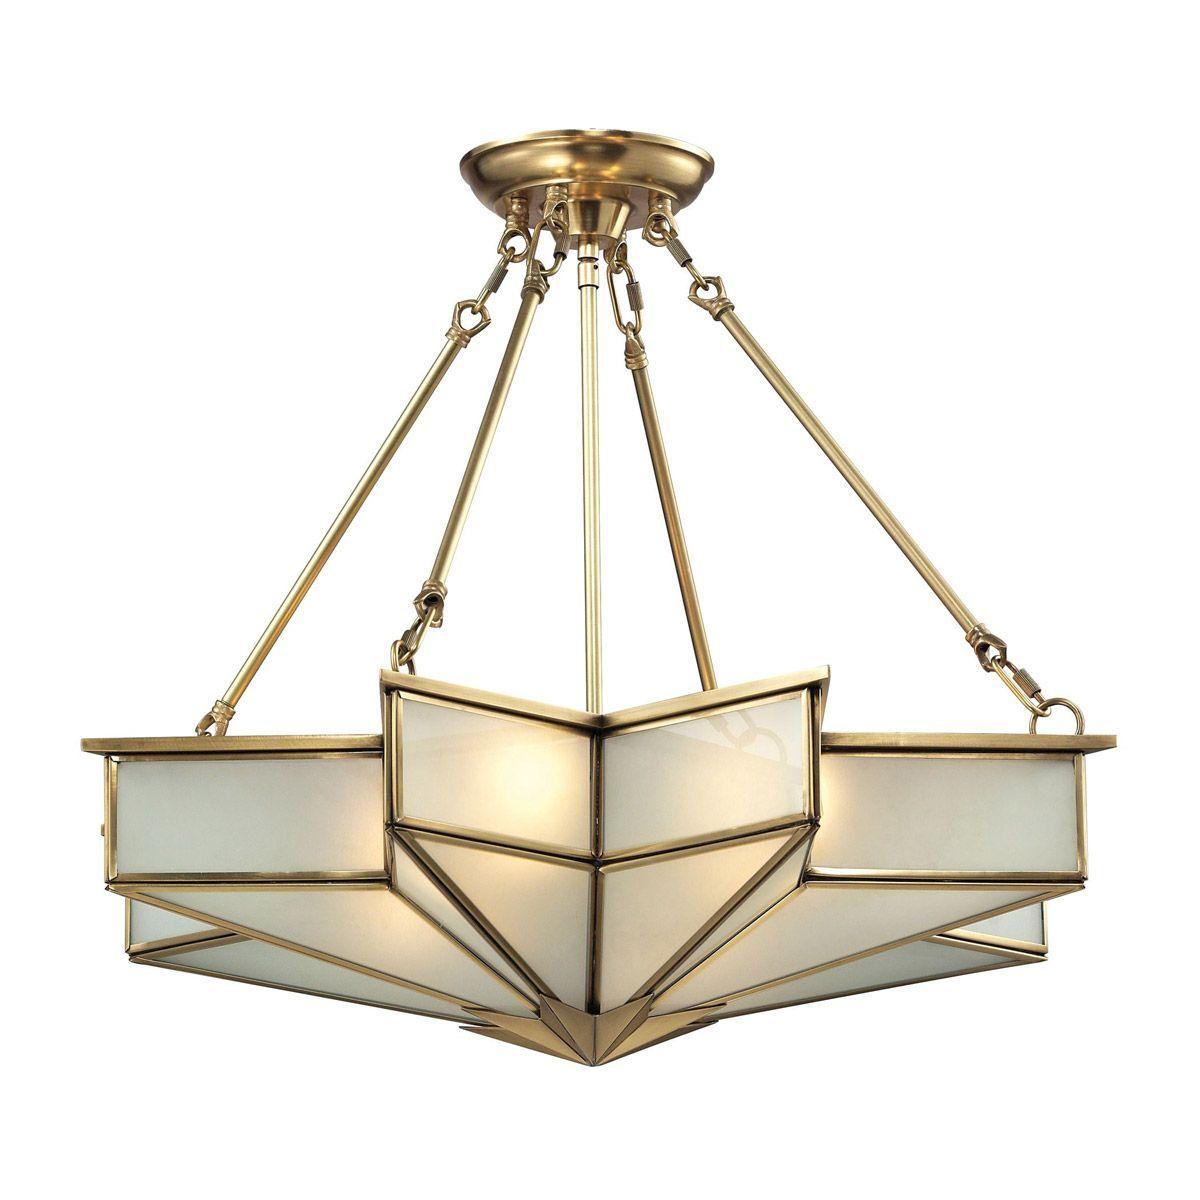 Elk 22012 4 The Best Selling Art Deco Lights On The Market Today Stacked Ball Acrylic Art De Art Deco Pendant Light Art Deco Lighting Art Deco Light Fixture